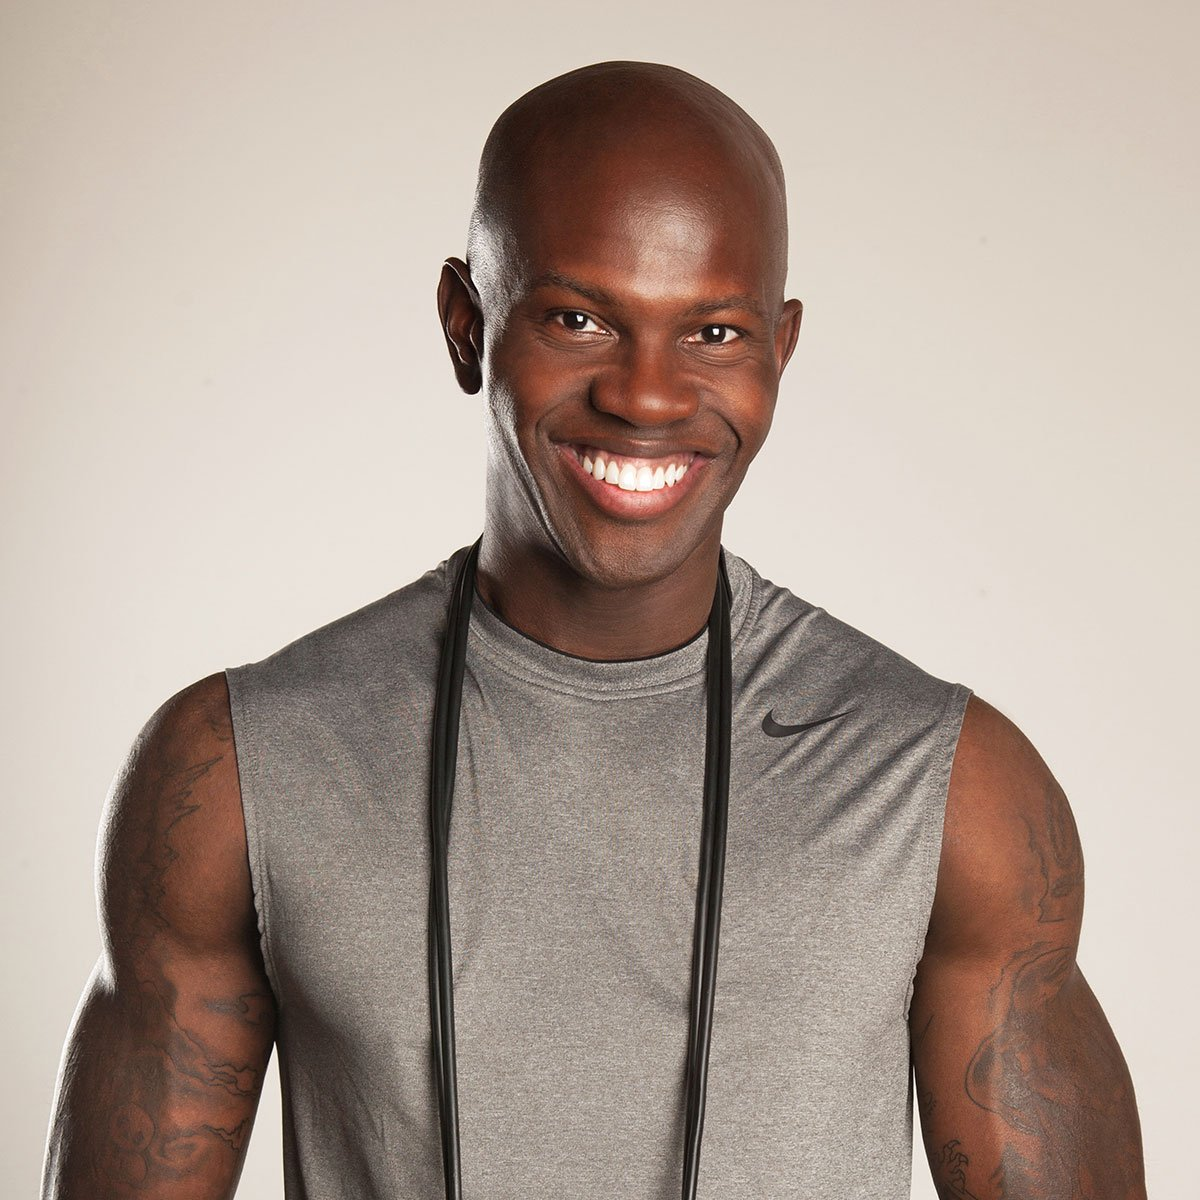 Doron Willis's Profile image